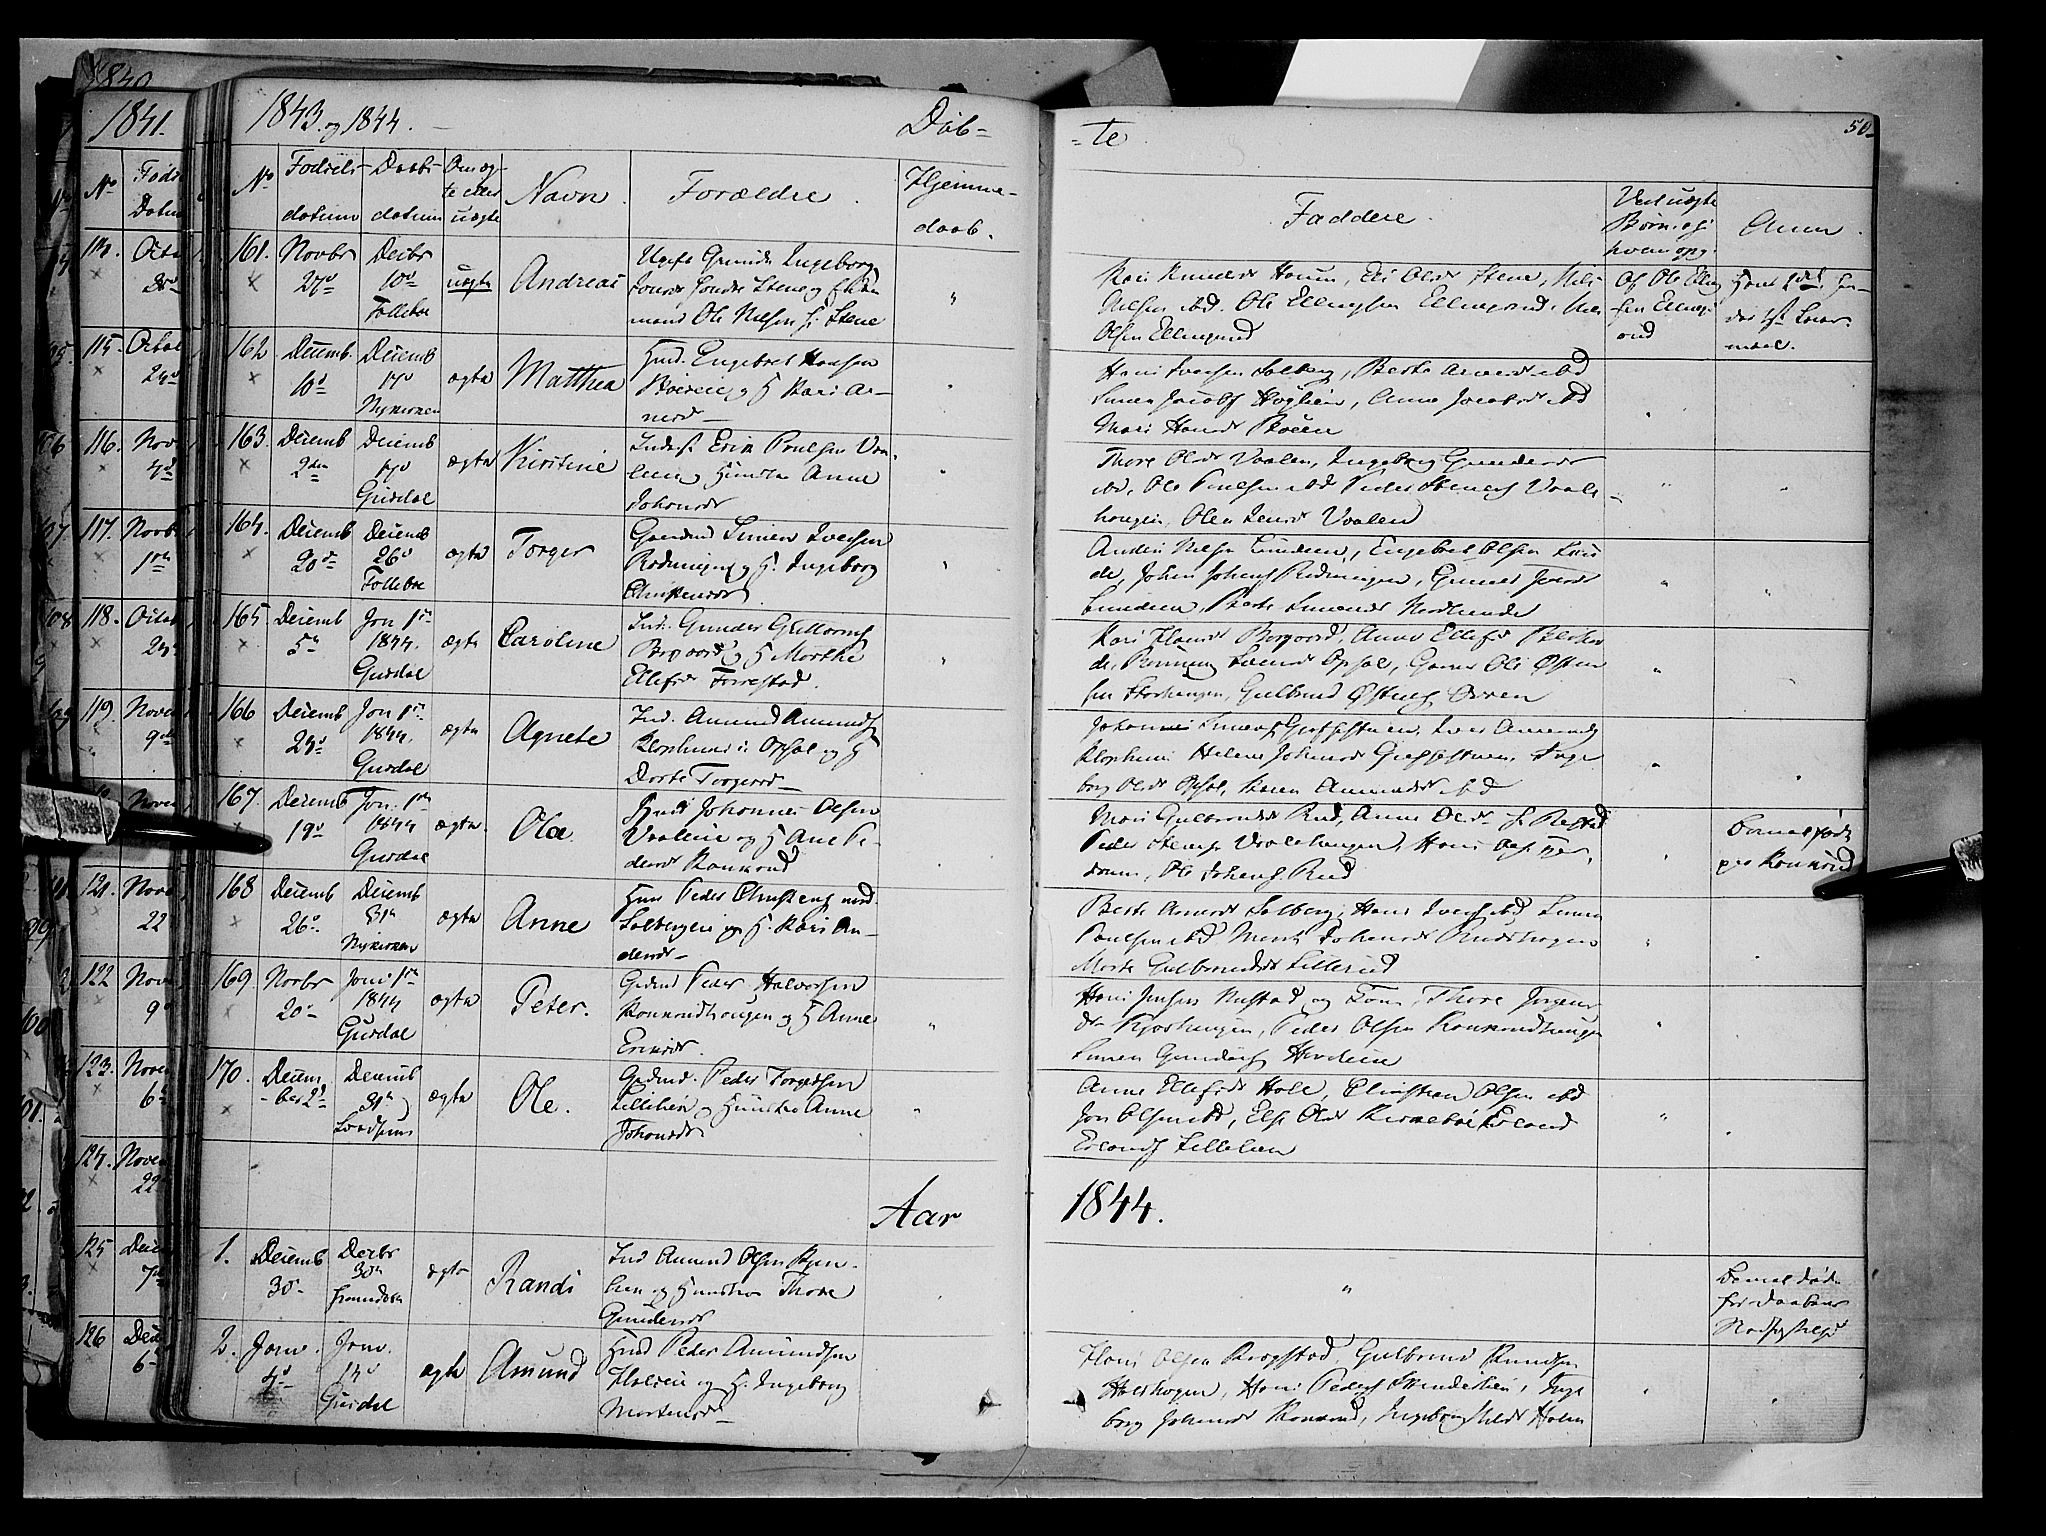 SAH, Gausdal prestekontor, Ministerialbok nr. 7, 1840-1850, s. 50